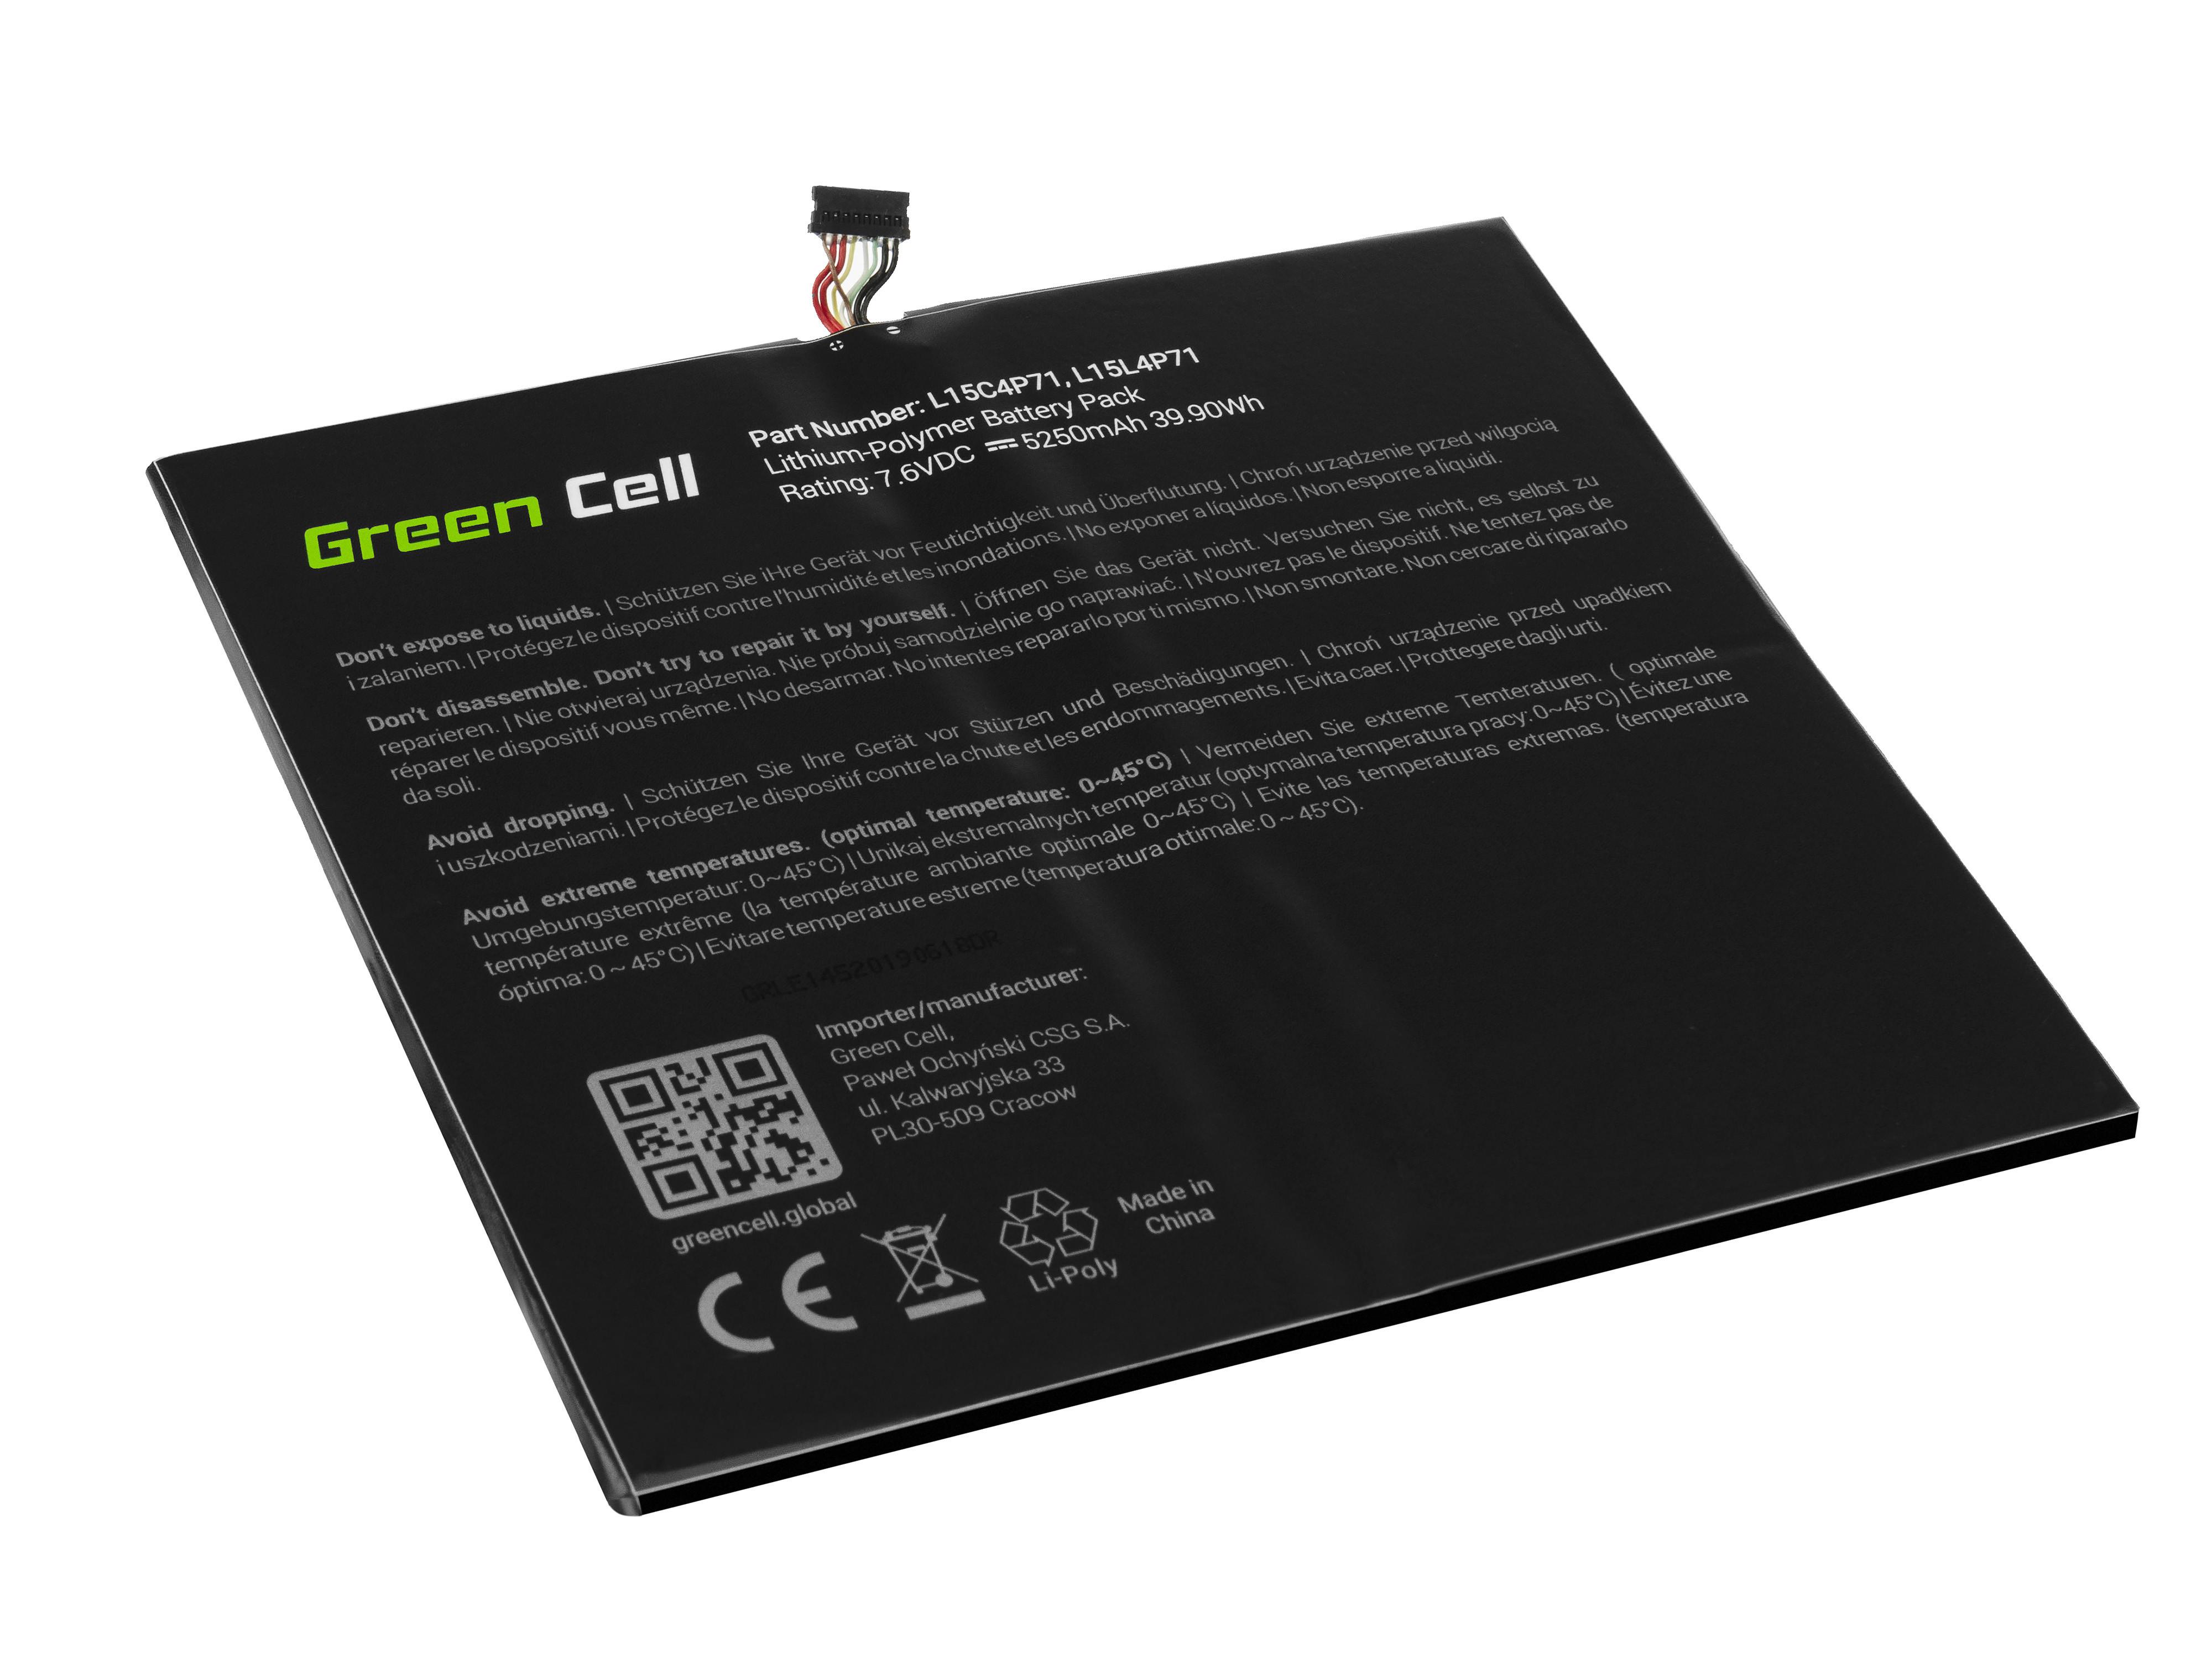 Green Cell LE145 Baterie Lenovo L15C4P71 L15L4P71 pro Lenovo Miix 700-12ISK 710-12IKB 5250mAh Li-Pol – neoriginální